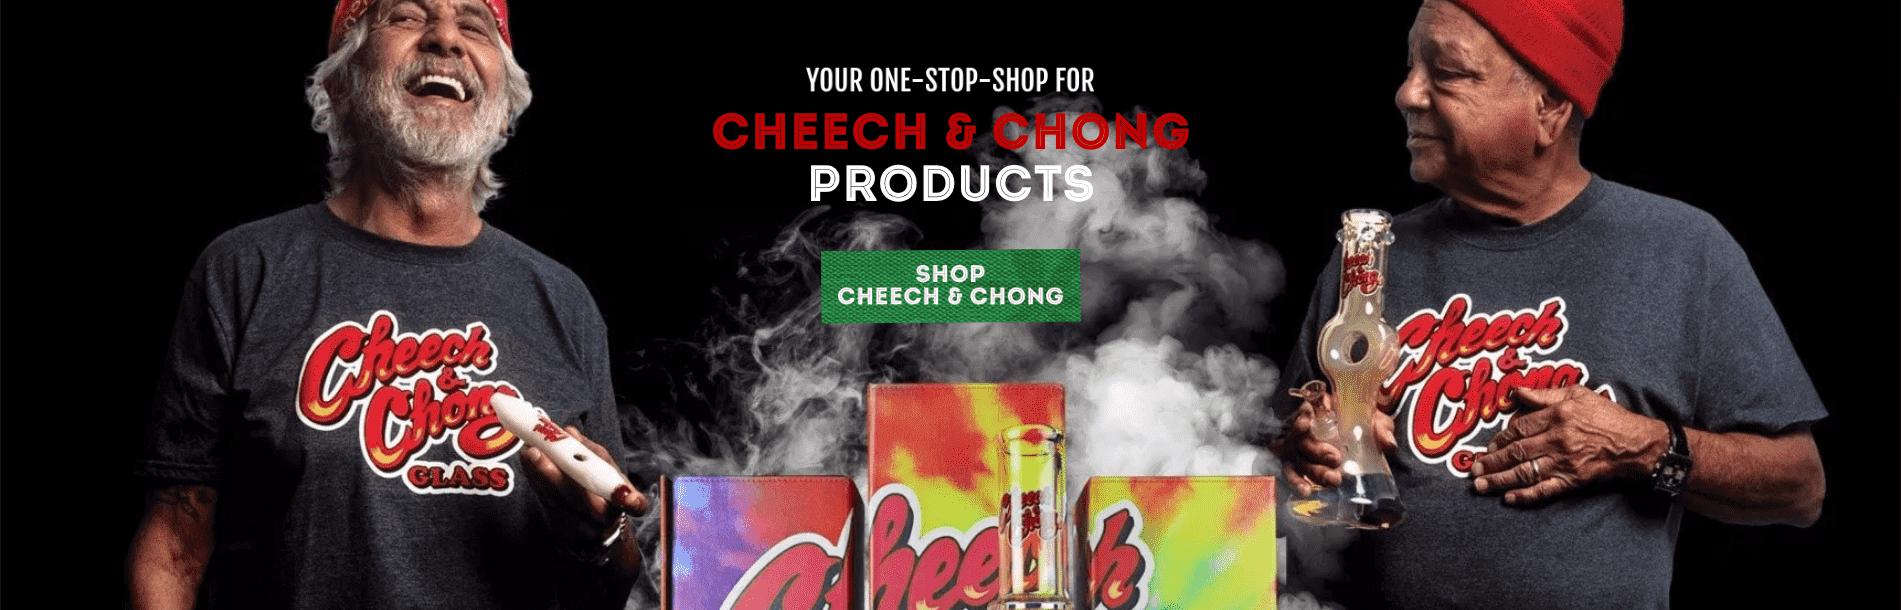 Cheech and Chong Bongs